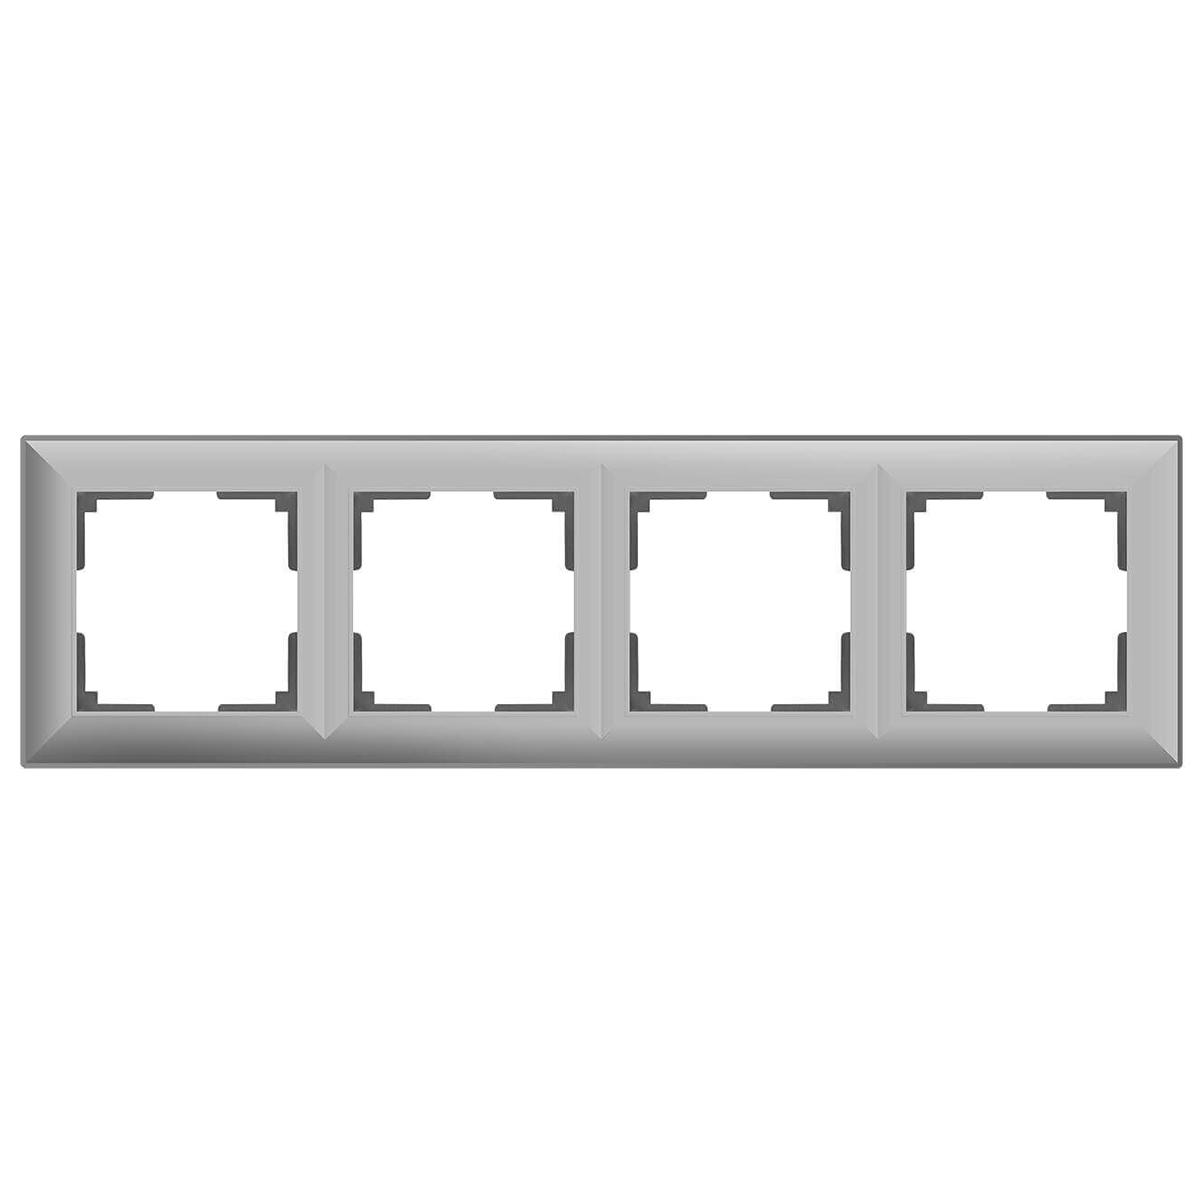 цена Рамка Fiore на 4 поста серебряный WL14-Frame-04 4690389109164 онлайн в 2017 году